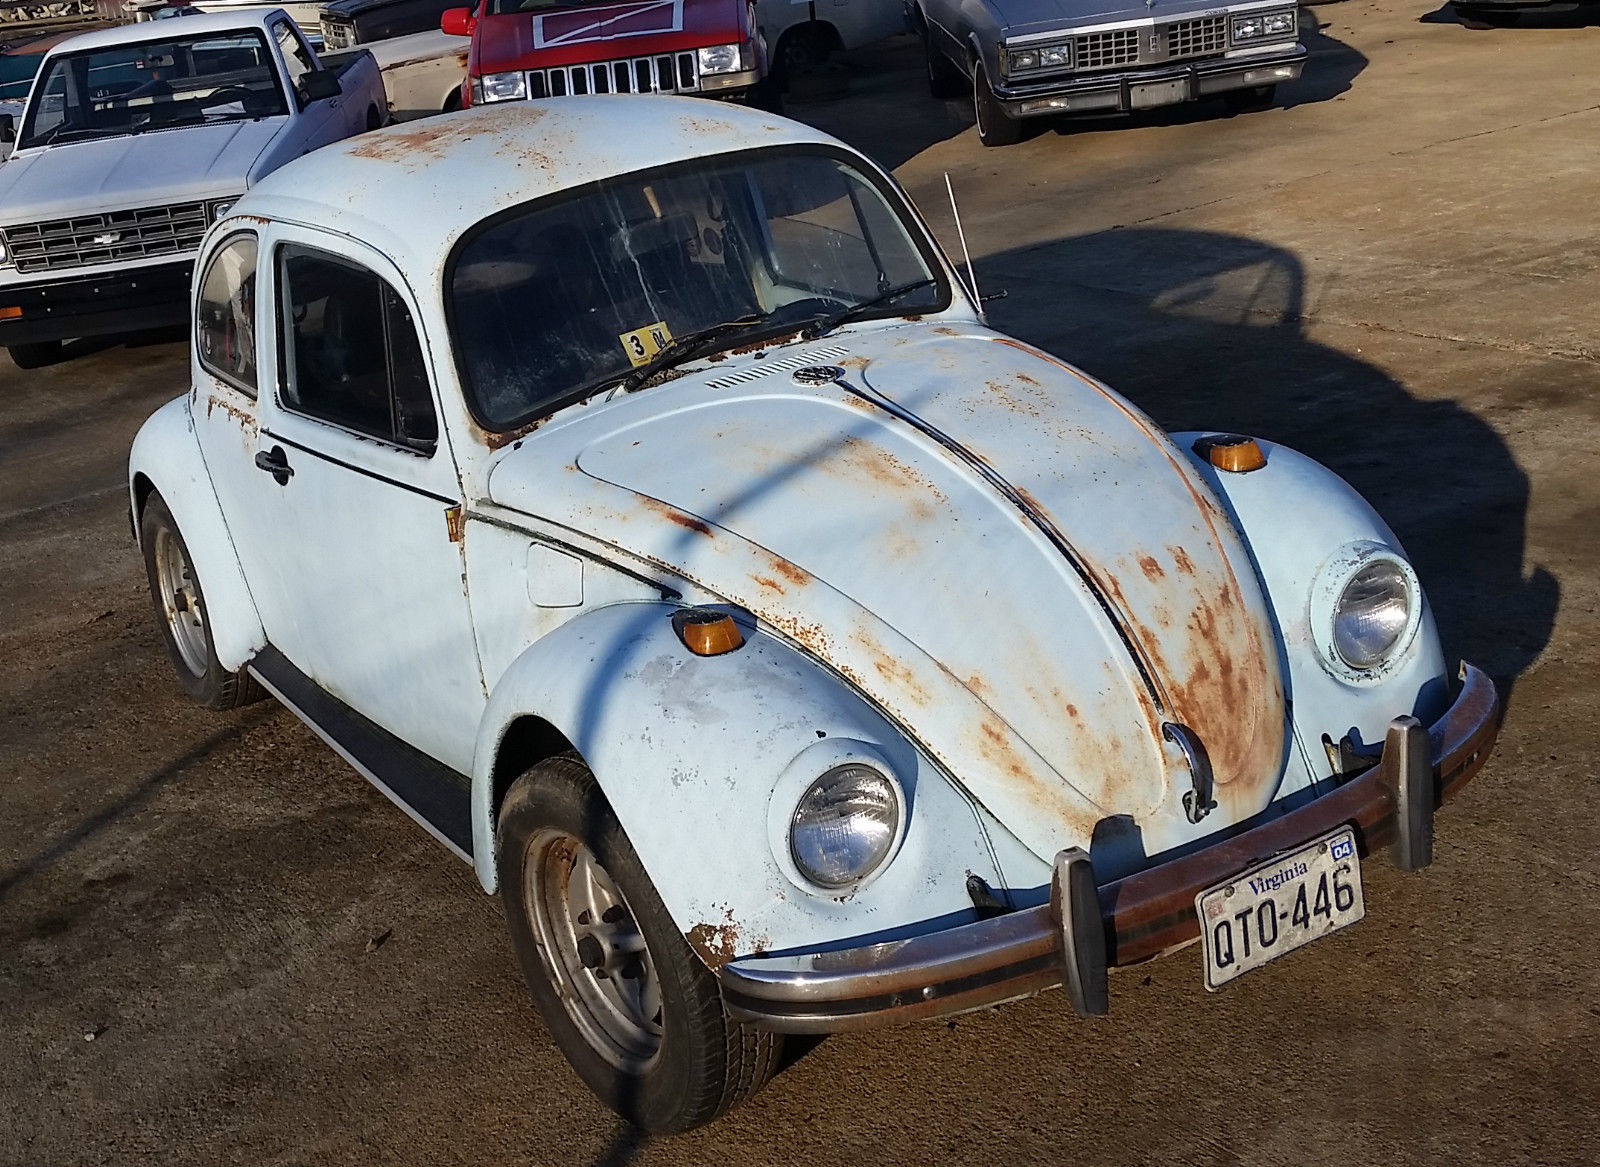 1968 Volkswagen Beetle Barn Find Many Upgrades